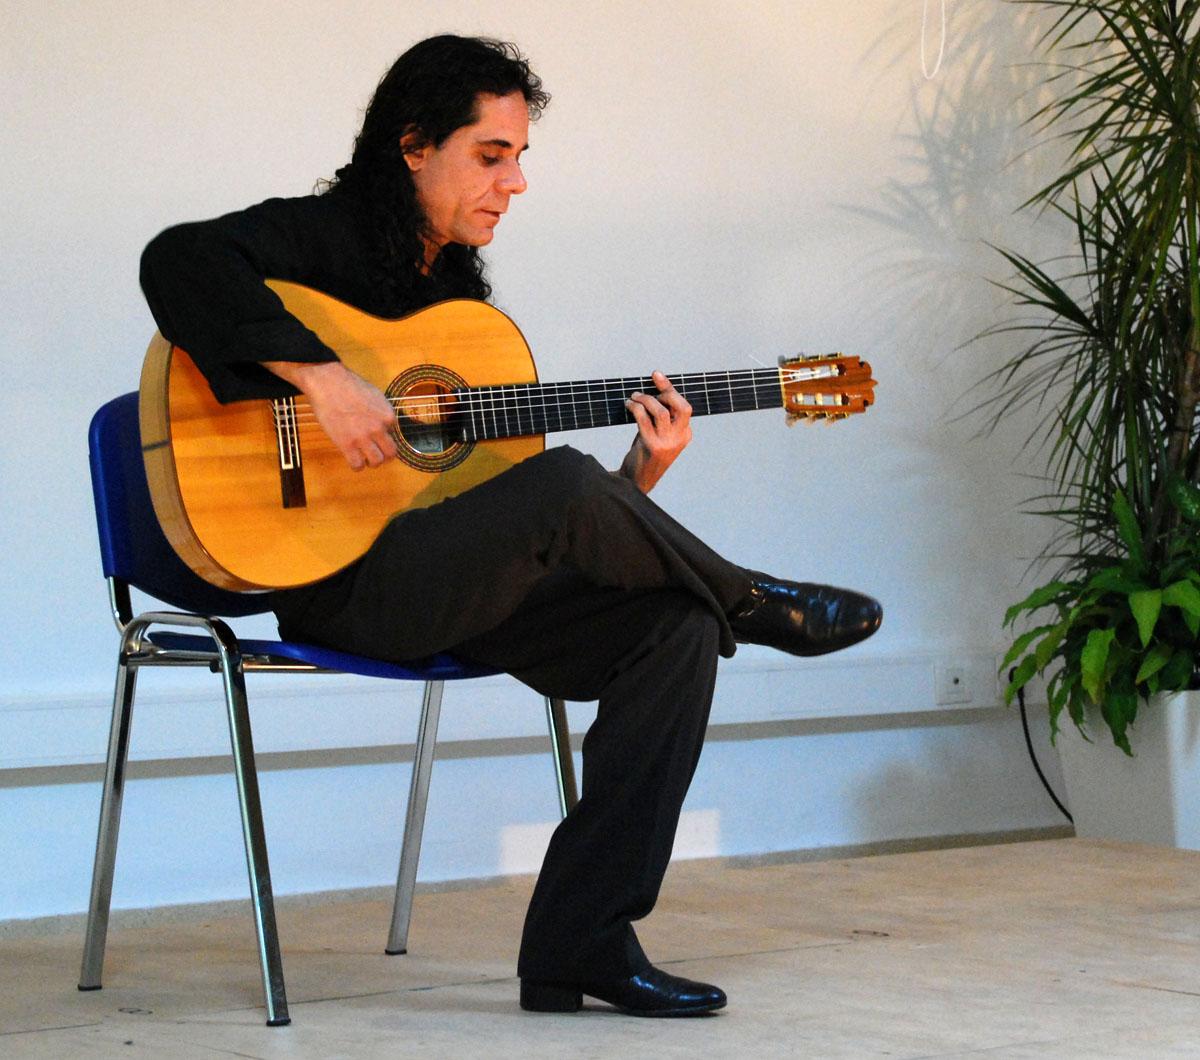 20210917103949_events_347_concierto-de-guitarra-flamenca-de-oscar-barrio-4.jpg